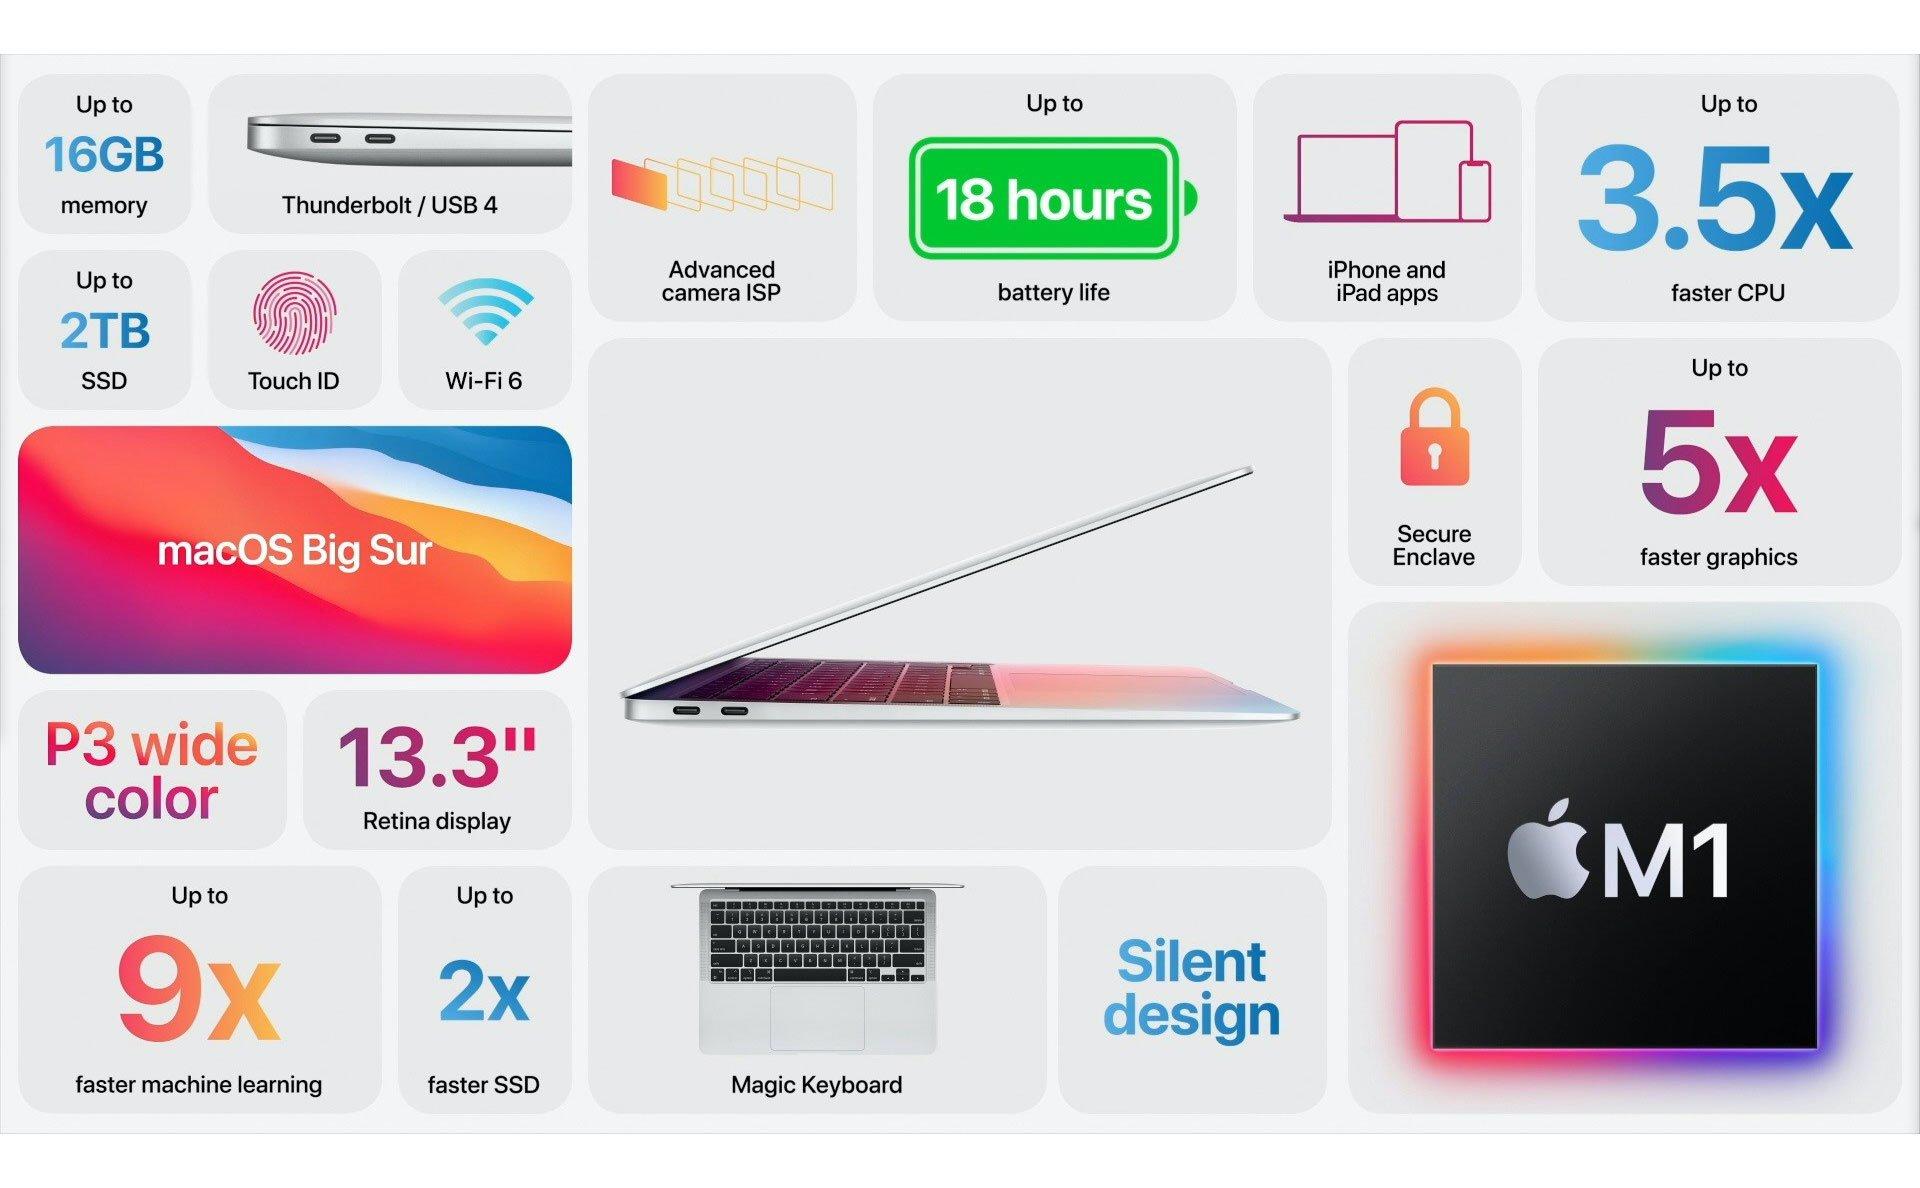 Macbook Air 2020 13 inch Apple M1 - Gold - 8GB RAM 256GB SSD - MGND3